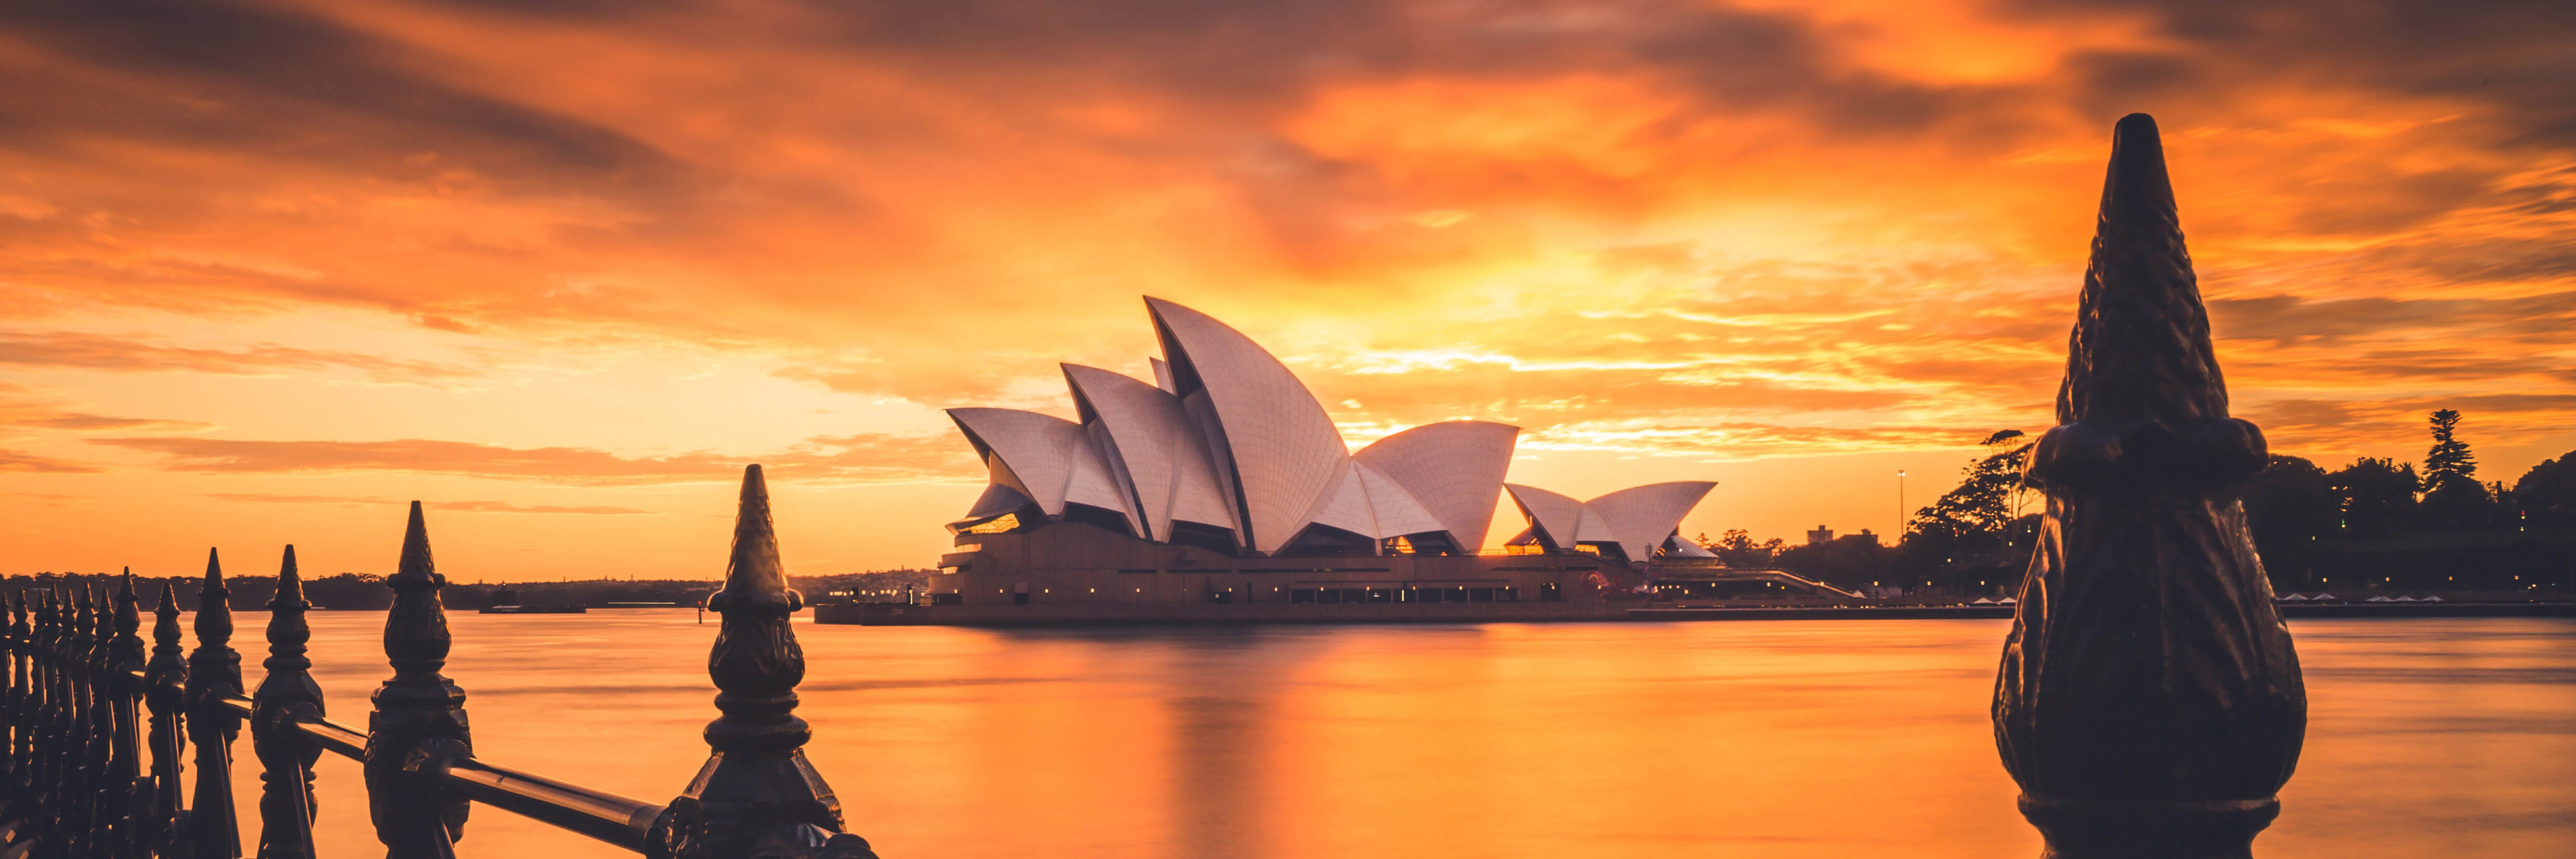 Sunrise at Circular Quay, Sydney, Australia